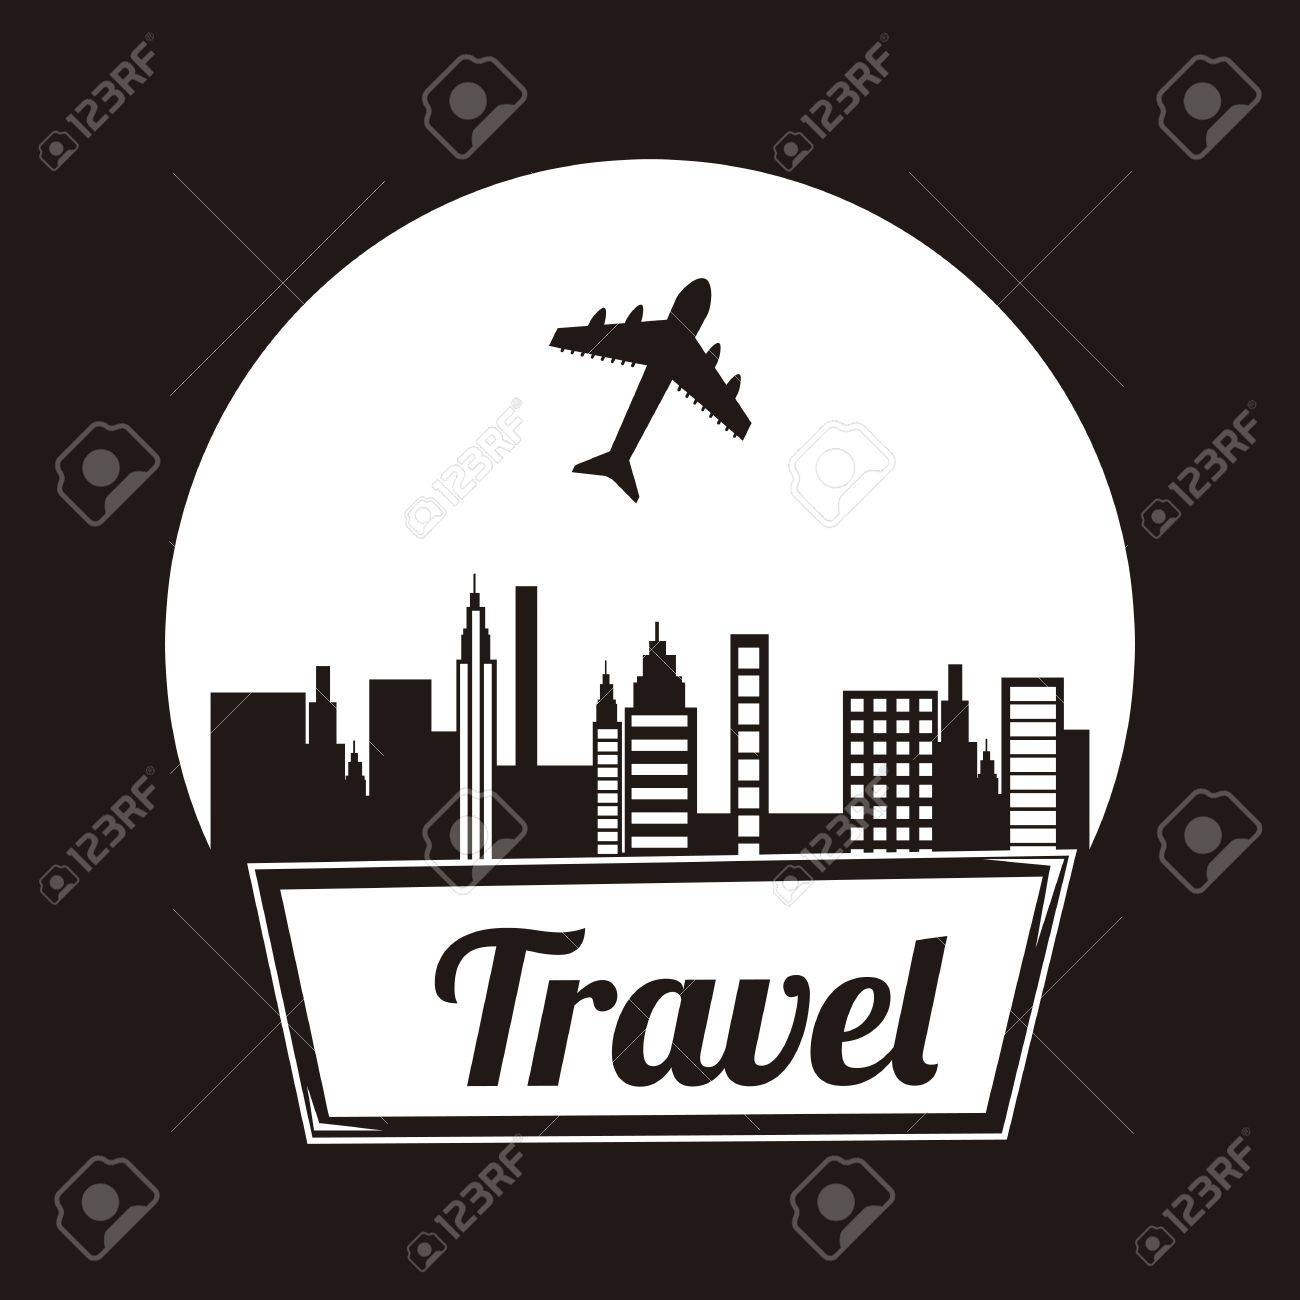 travel frame over black background illustration Stock Vector - 19674367